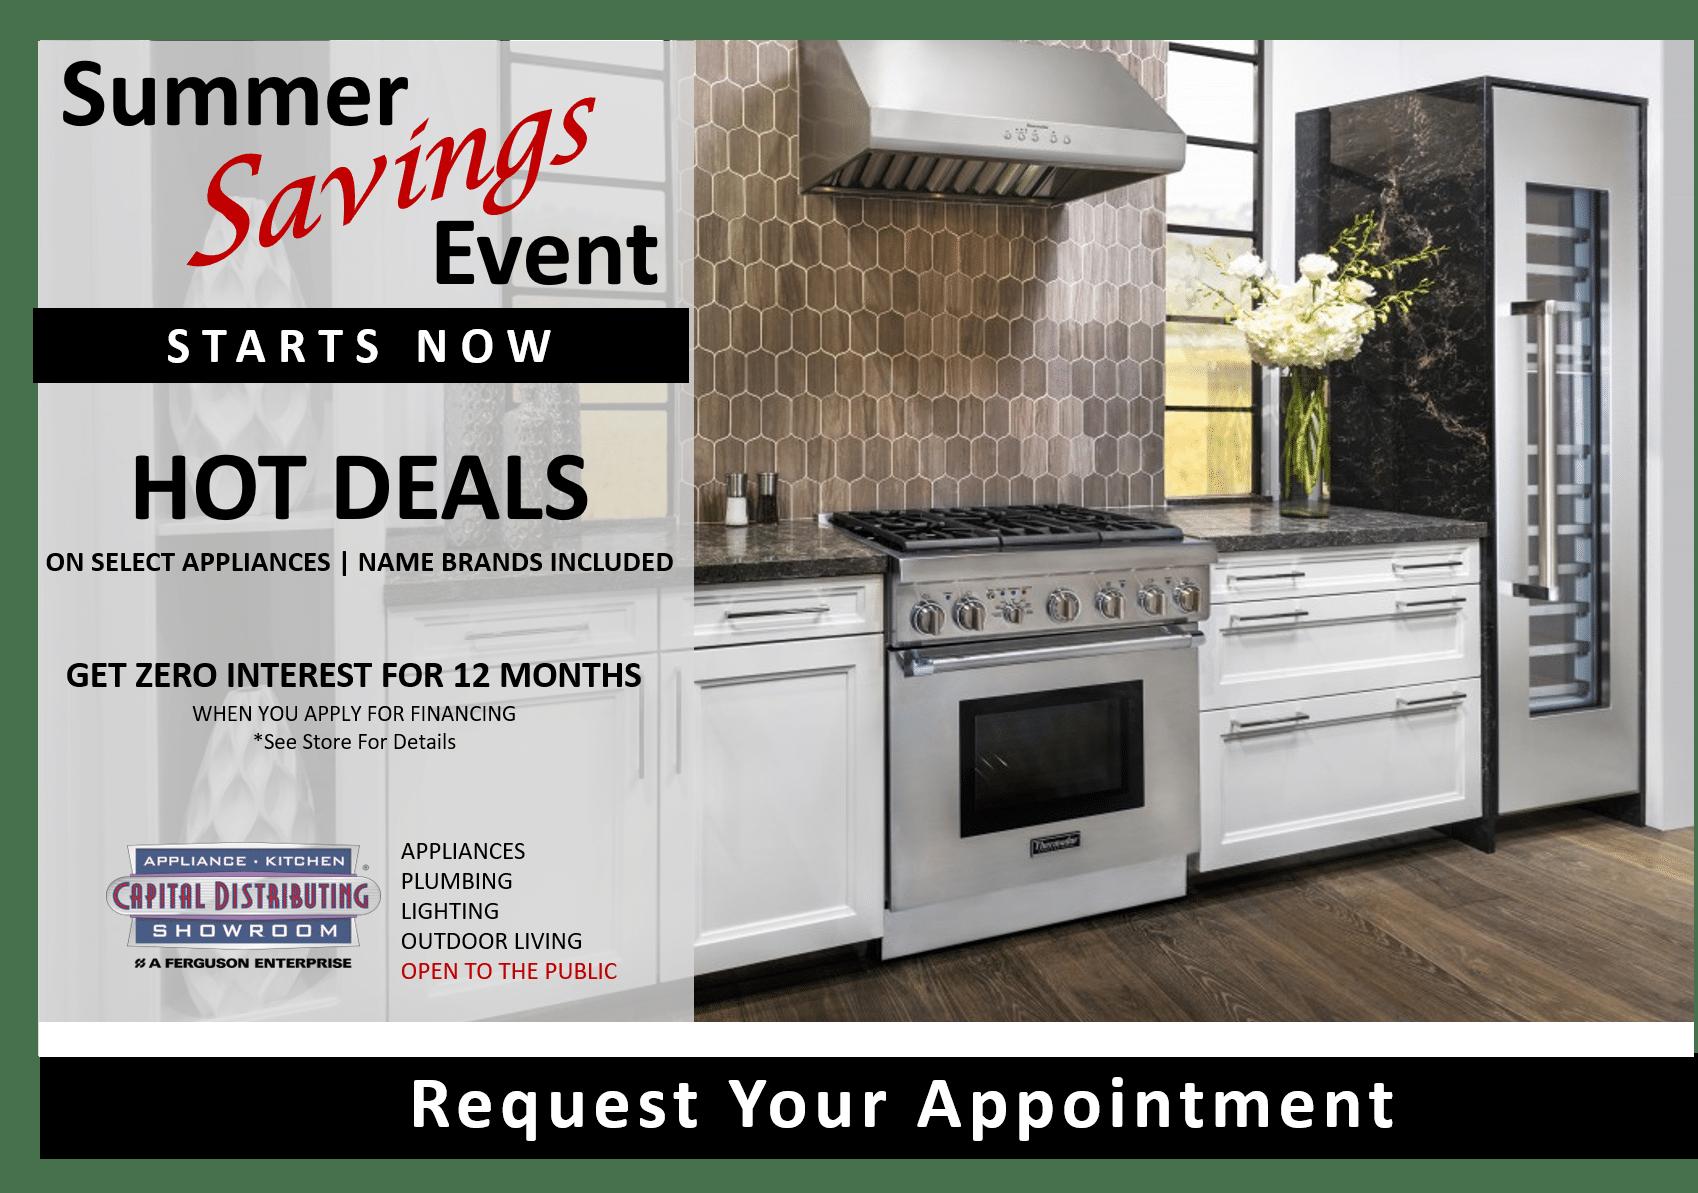 Summer Savings 2021 | Capital Distributing Kitchen Appliance Showroom